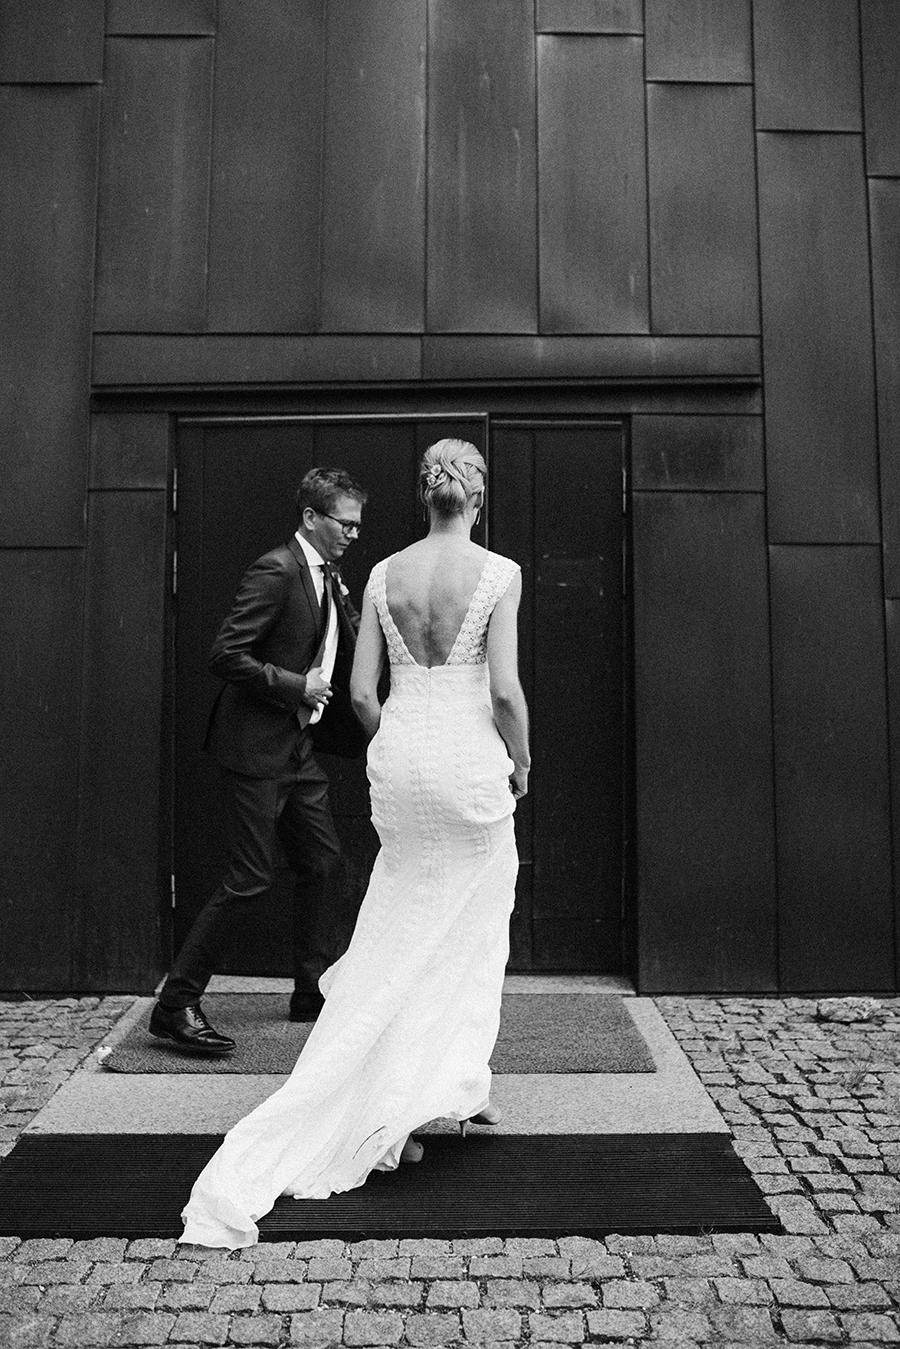 Laura & Kalle's modern wedding in a greenhouse at Harjattulan Kartano, Turku